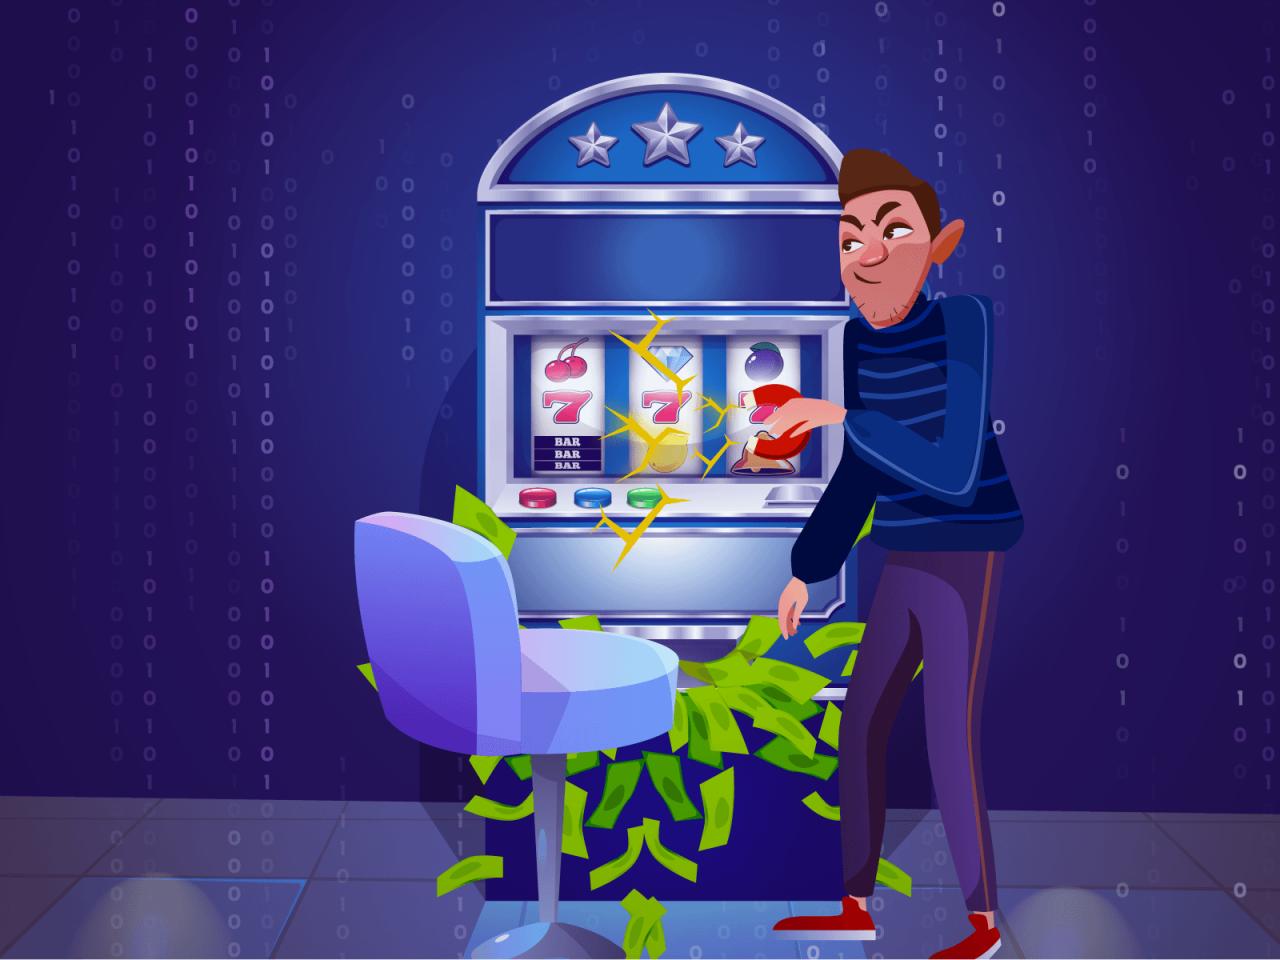 12 Sneaky Ways To Cheat At Slots - Casino.org Blog